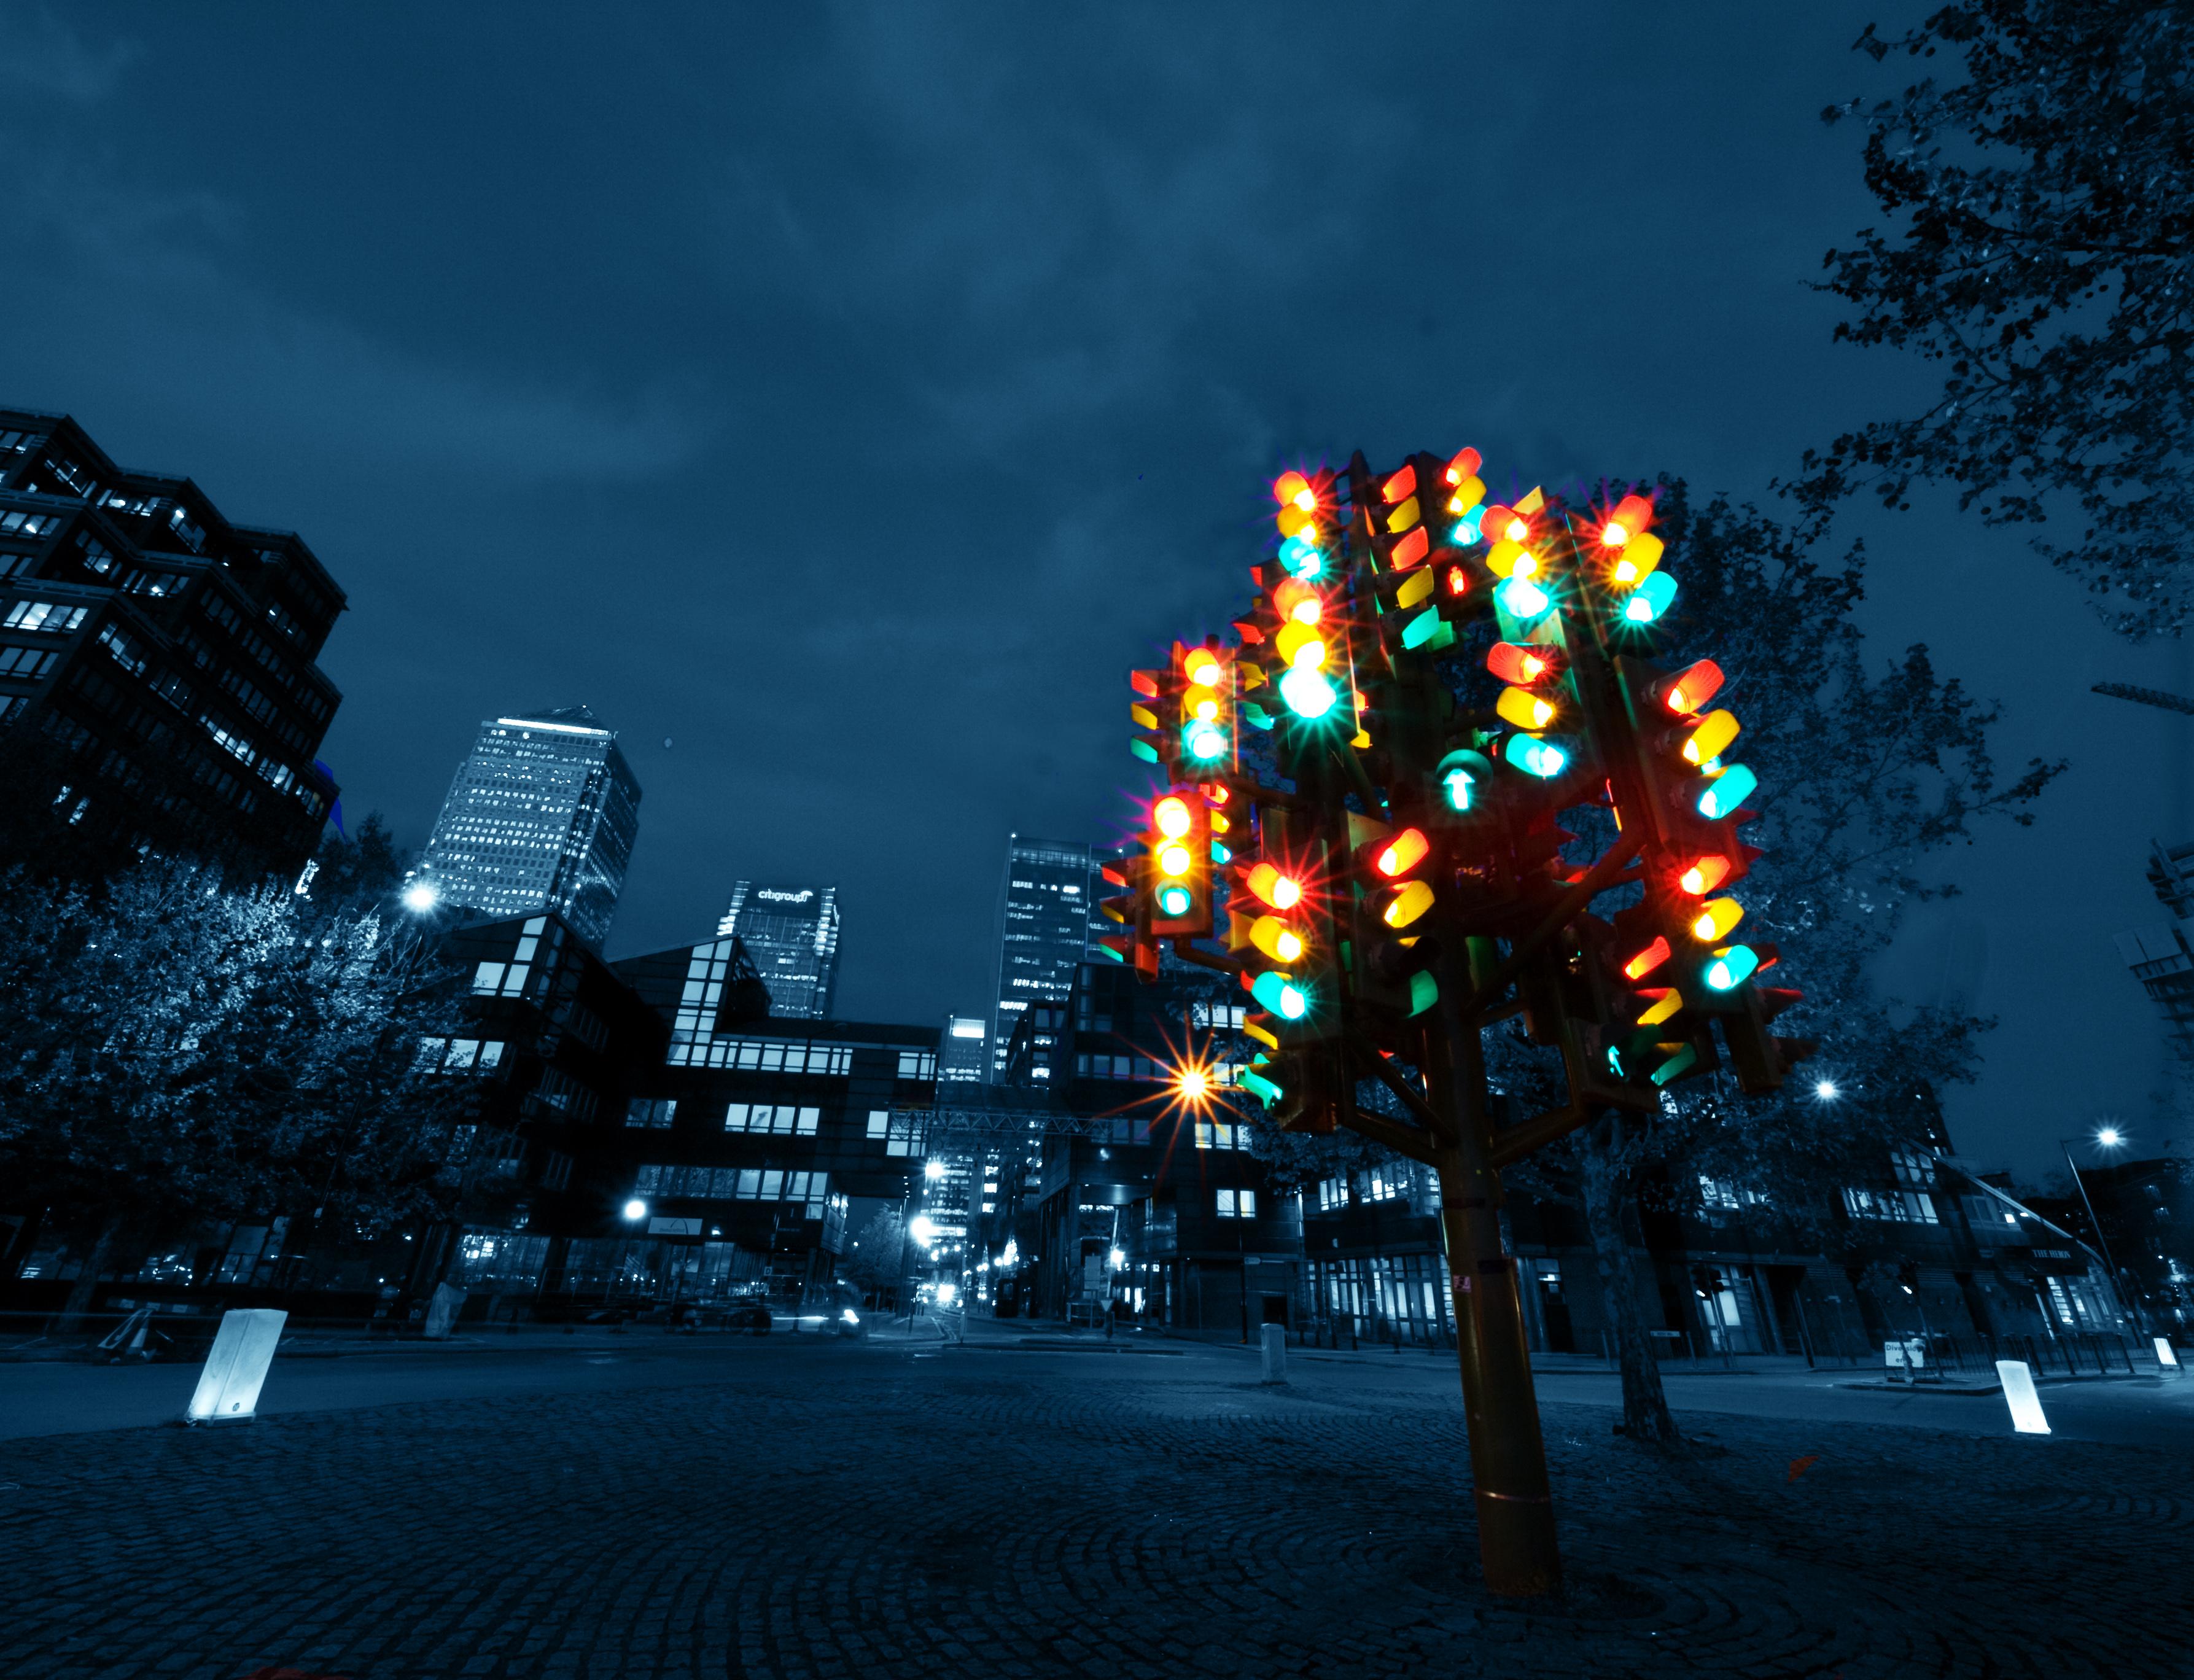 File:Traffic Light Tree.jpg - Wikimedia Commons for Real Traffic Light Night  117dqh